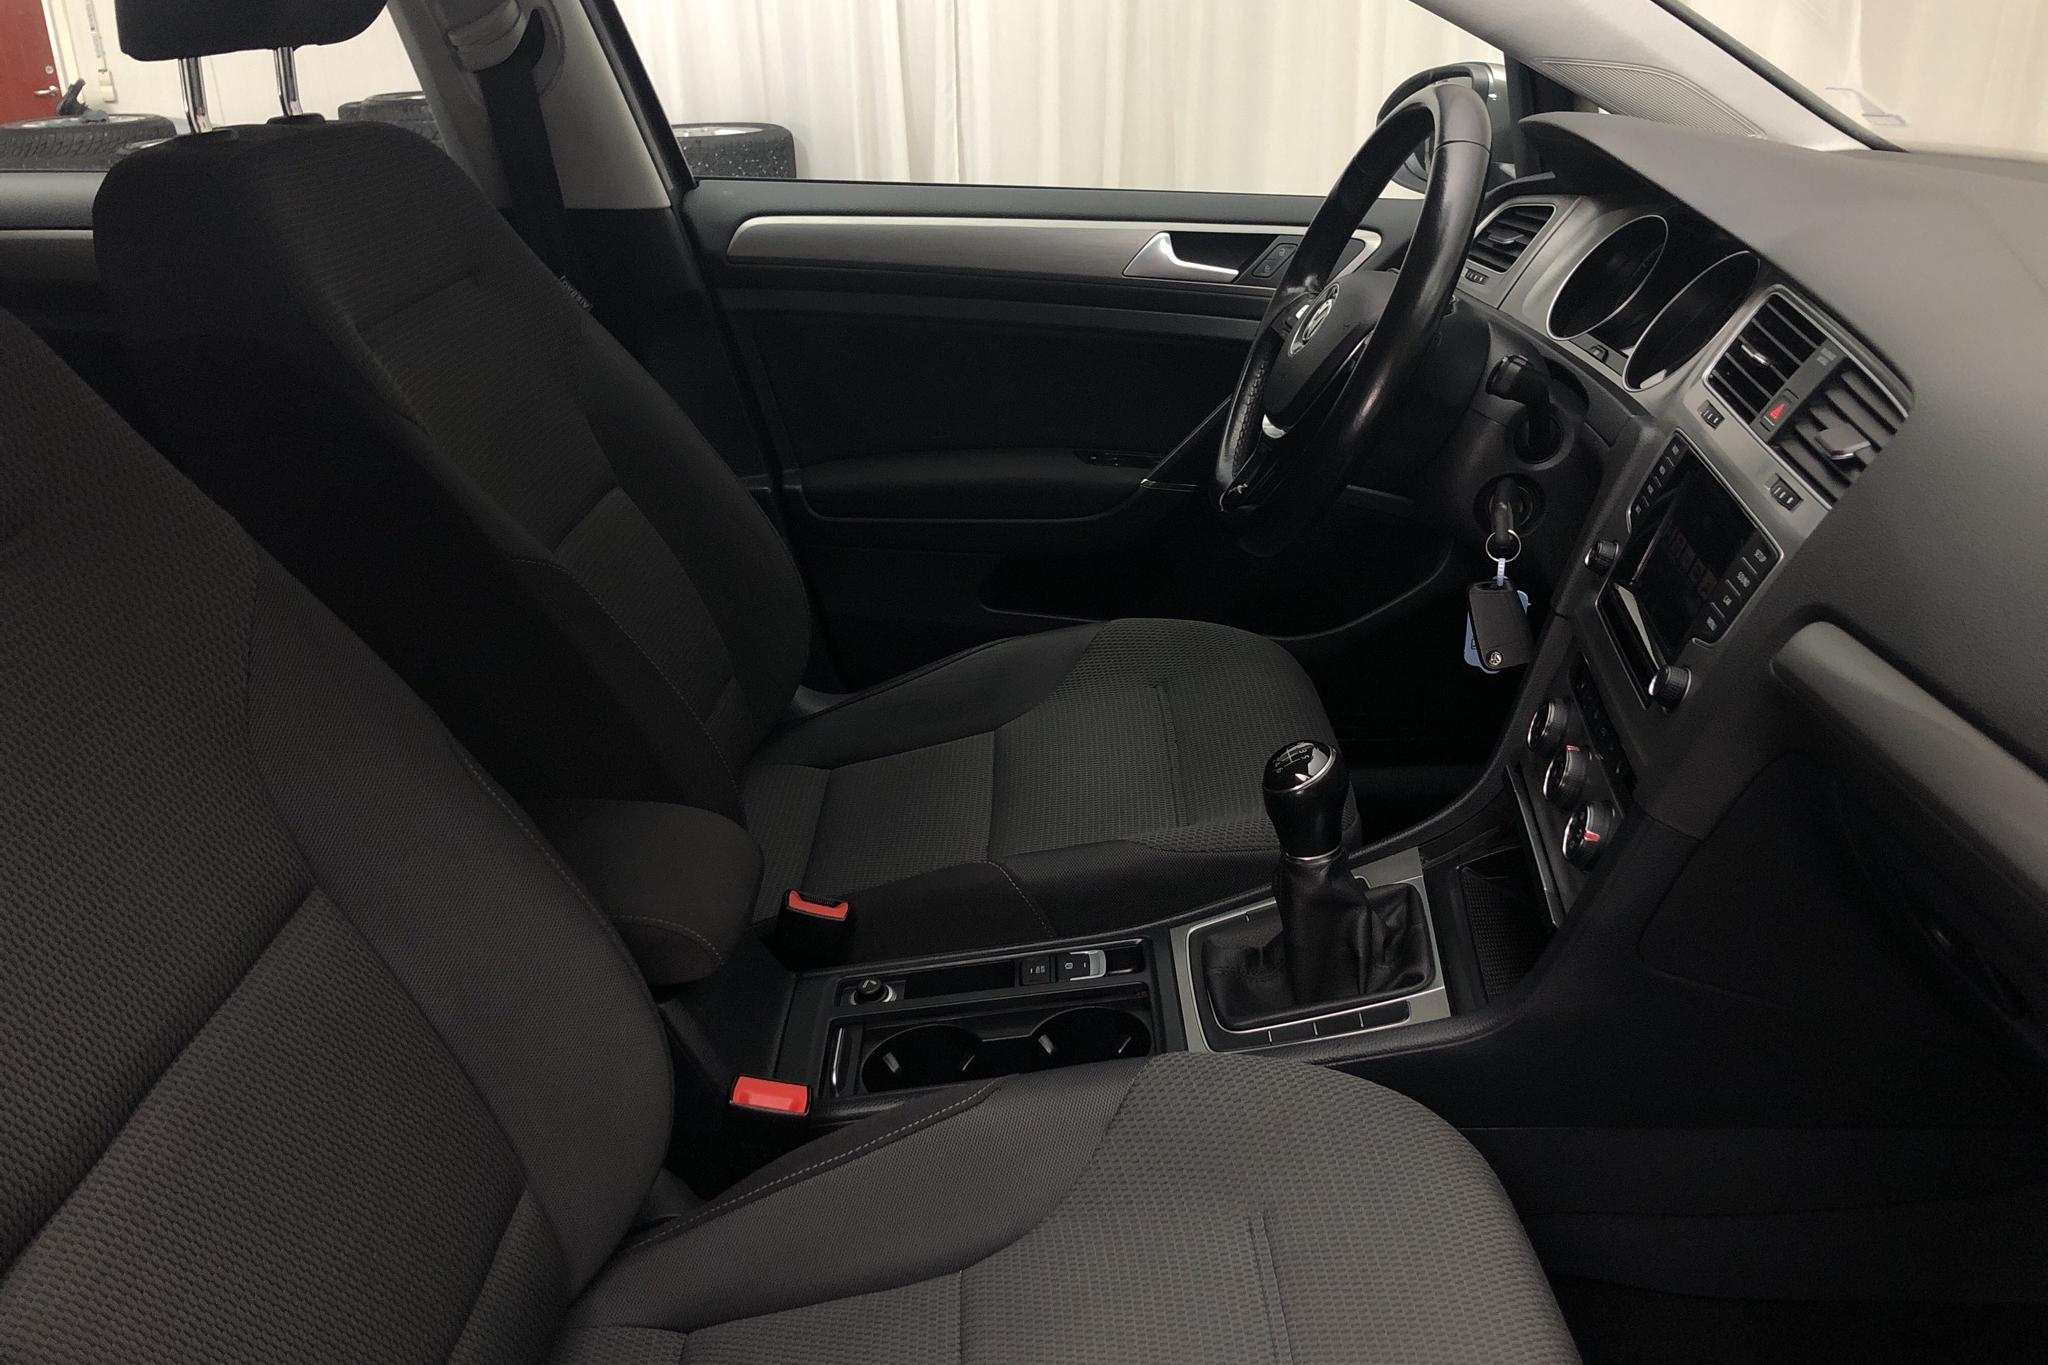 VW Golf VII 1.2 TSI 5dr (105hk) - 9 689 mil - Manuell - grå - 2015